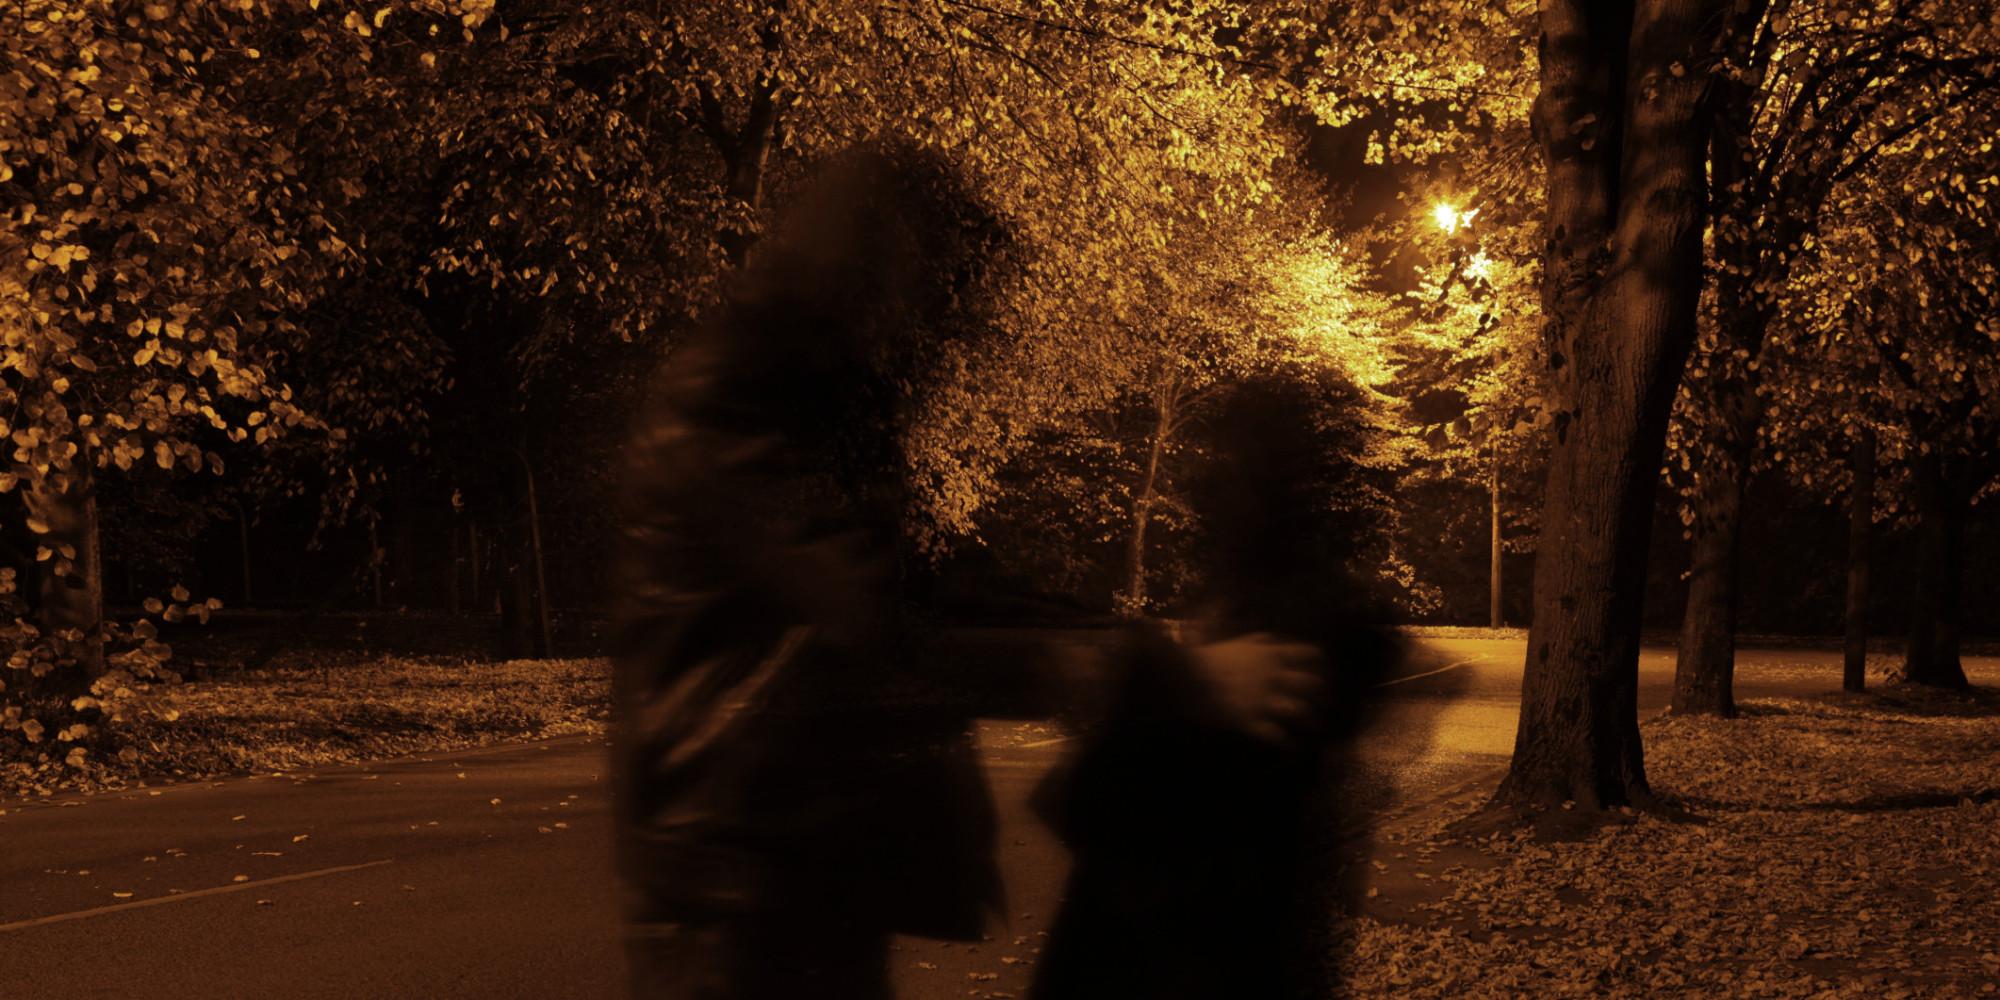 o-women-afraid-street-dark-facebook.jpg